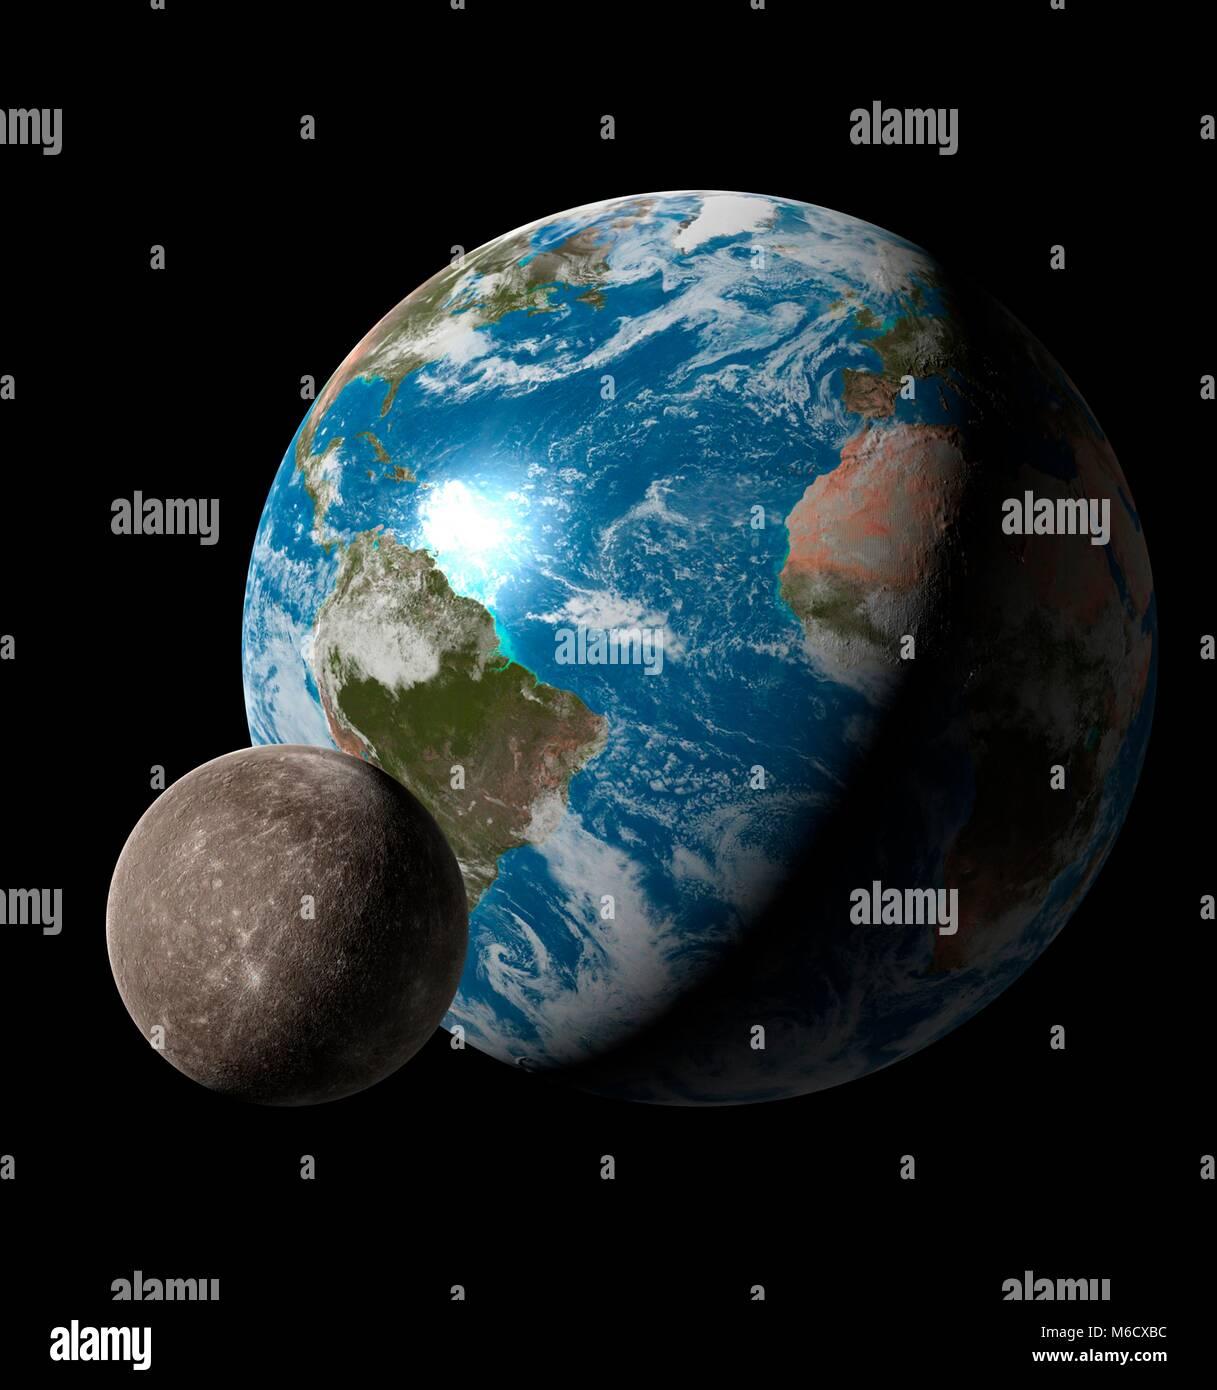 Entfernung Sonne Merkur